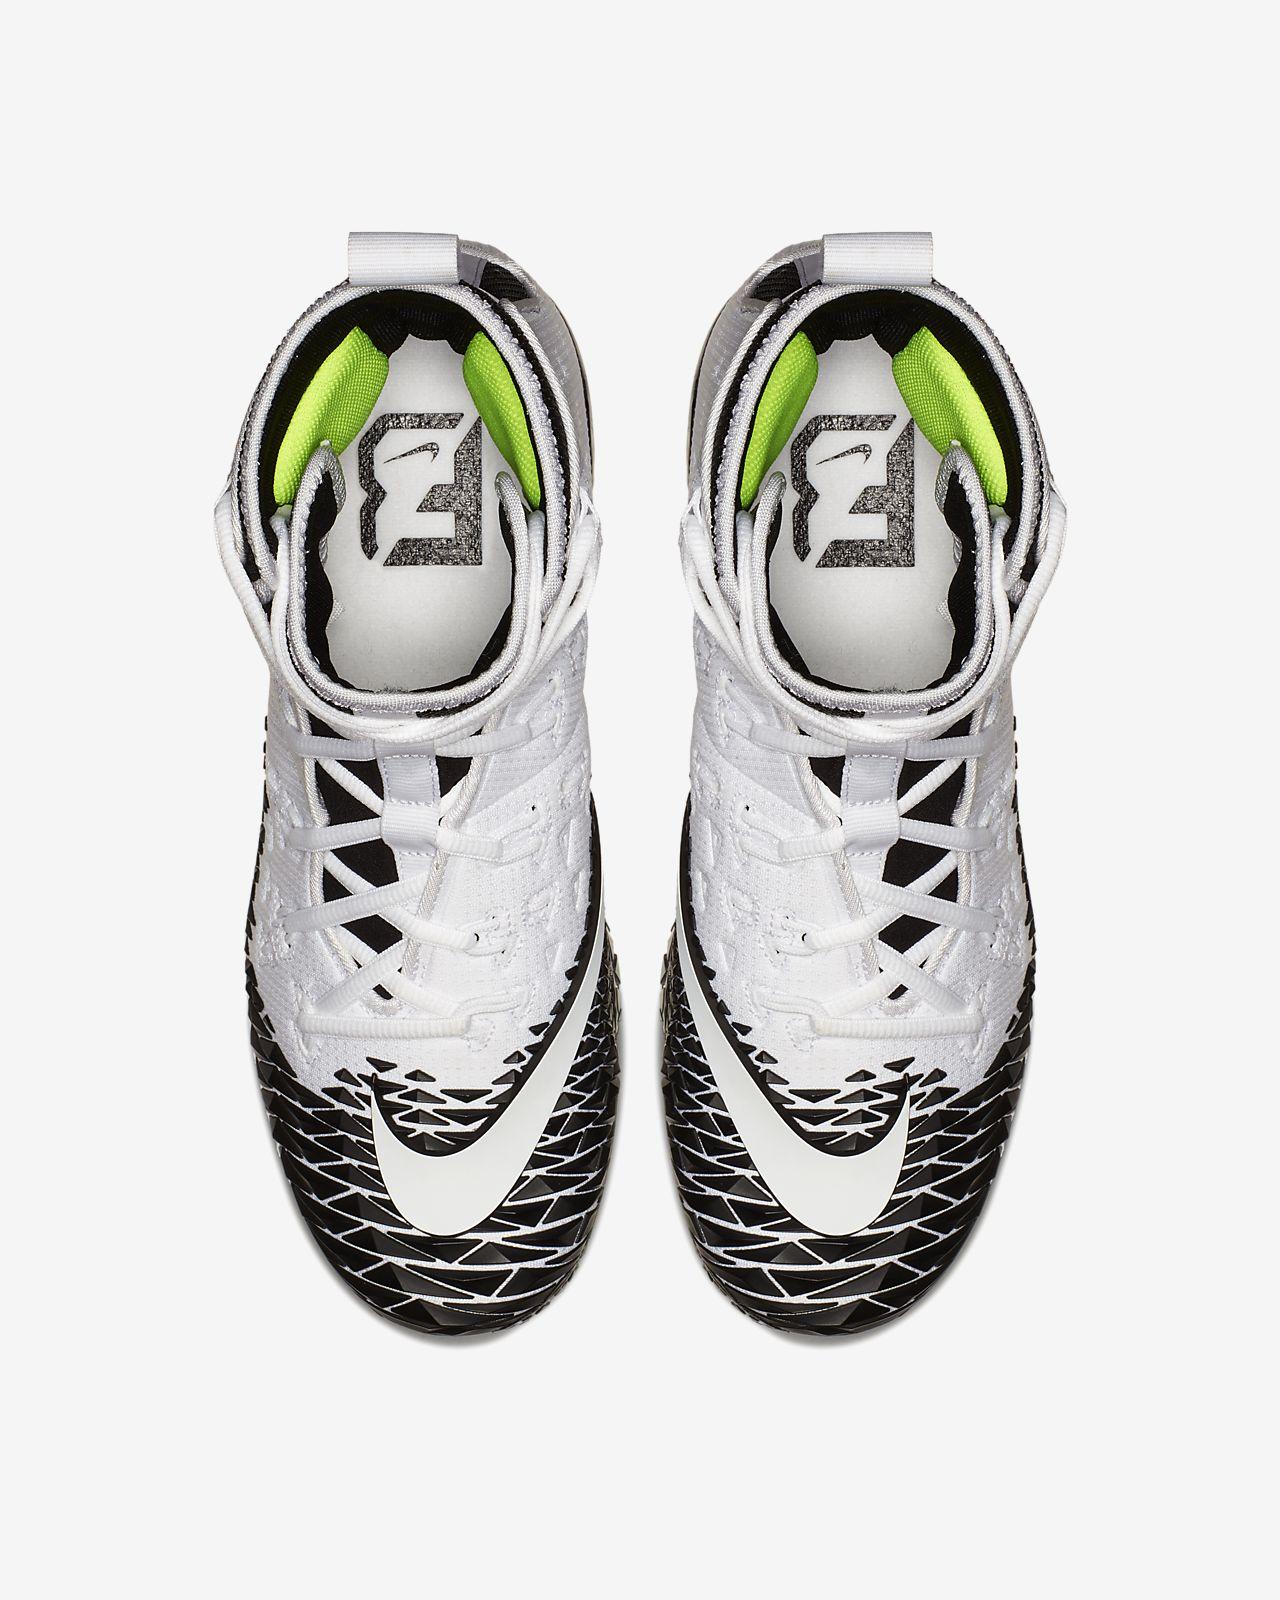 size 40 c9914 fee49 ... Nike Force Savage Elite TD Men s Football Cleat